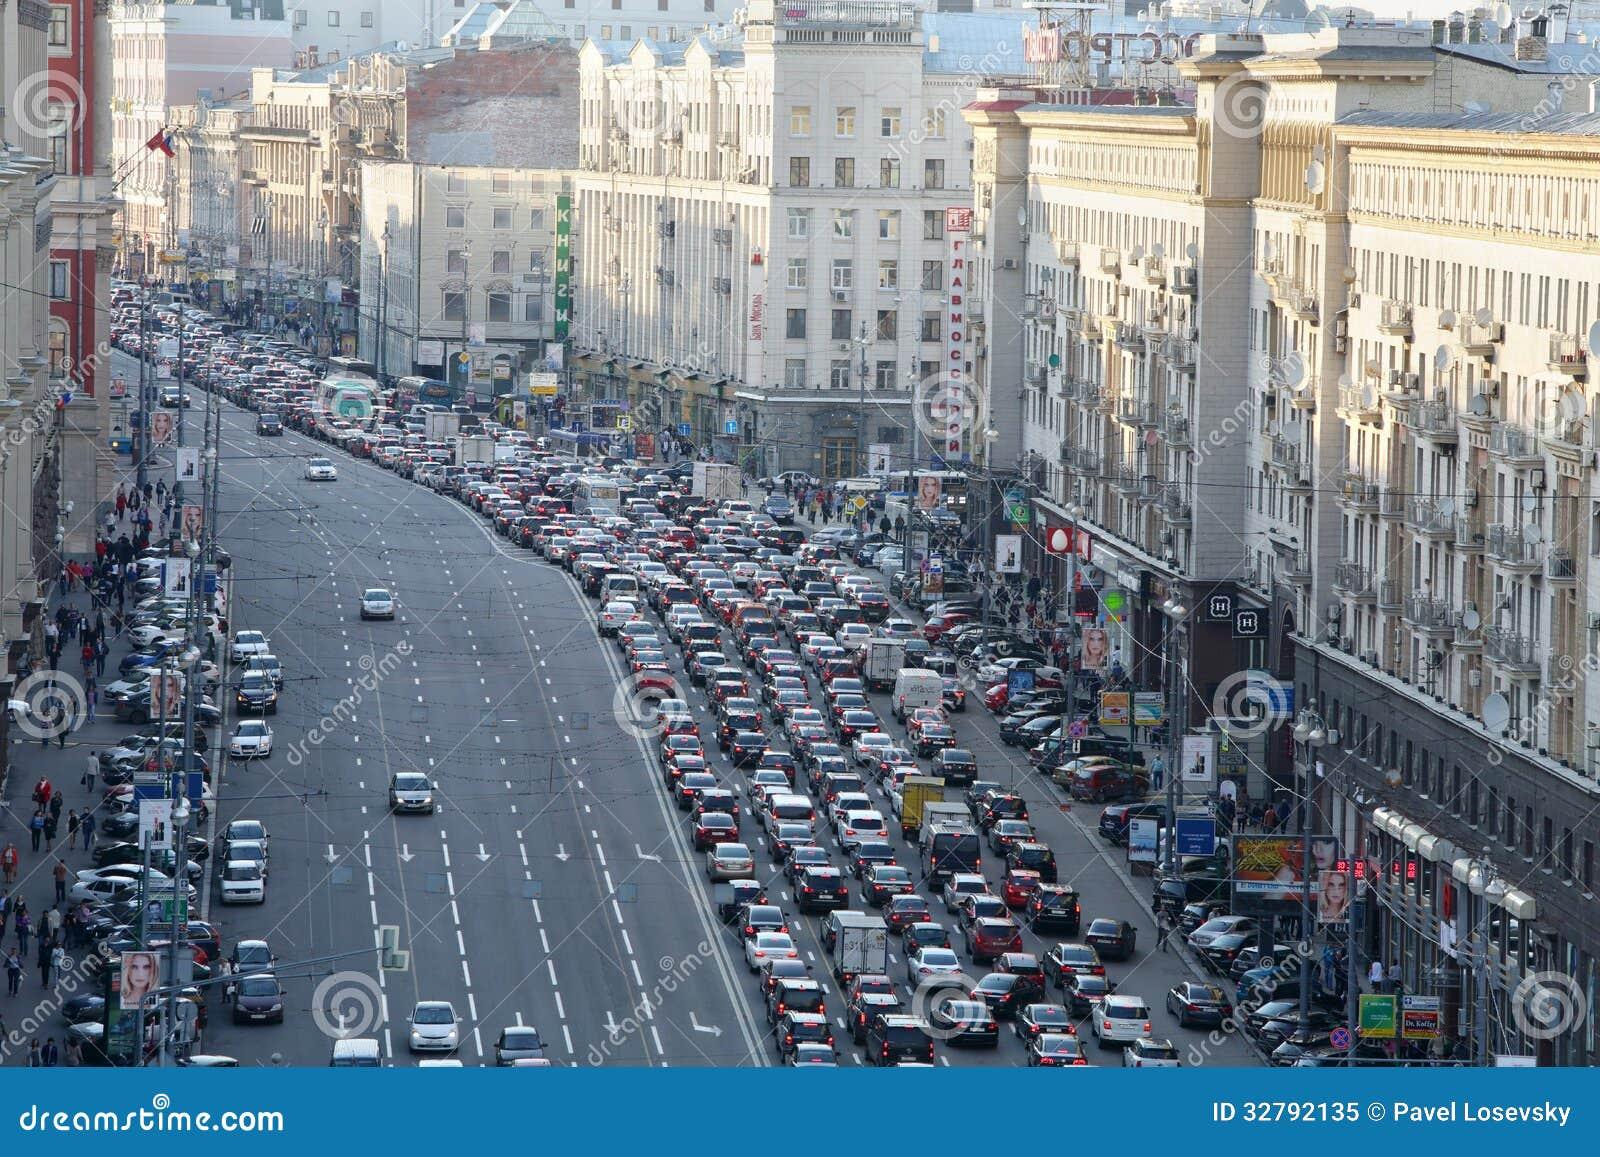 Rush Truck Center >> Traffic Jam On Tverskaya St. Editorial Image - Image of ...